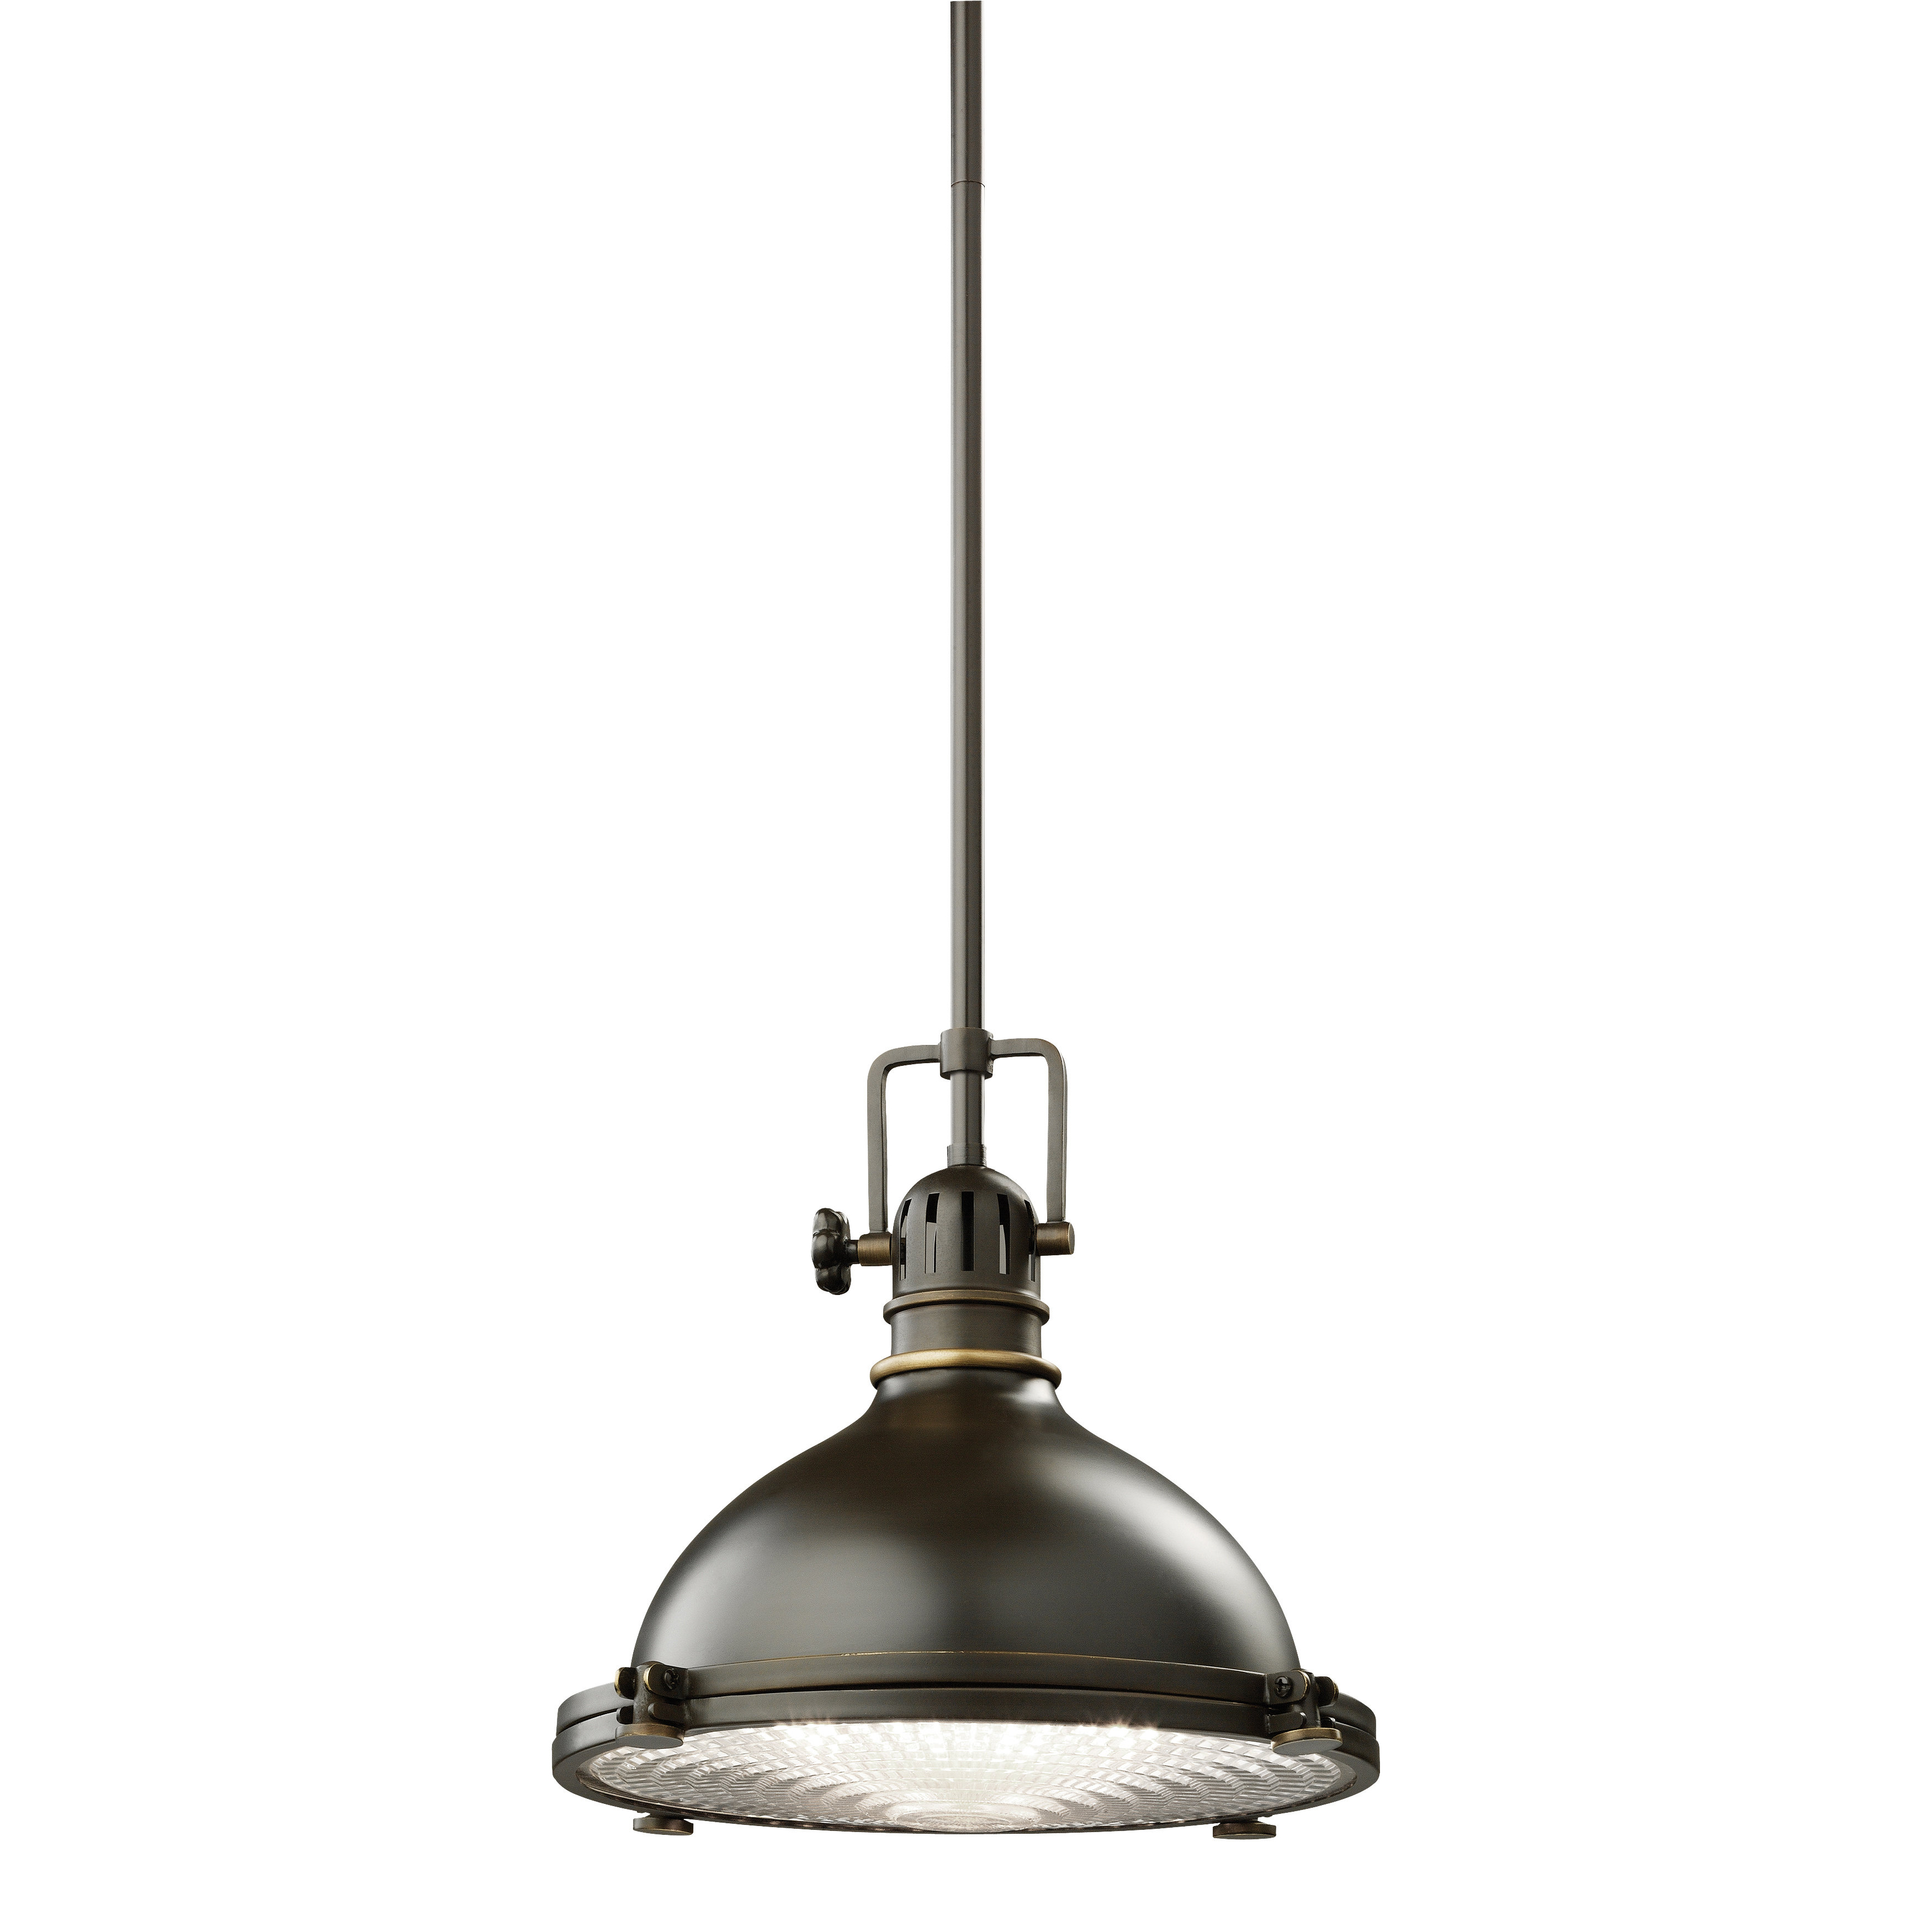 Hamilton 1 Light Single Dome Pendants With 2019 Fresnel 1 Light Dome Pendant (View 13 of 20)